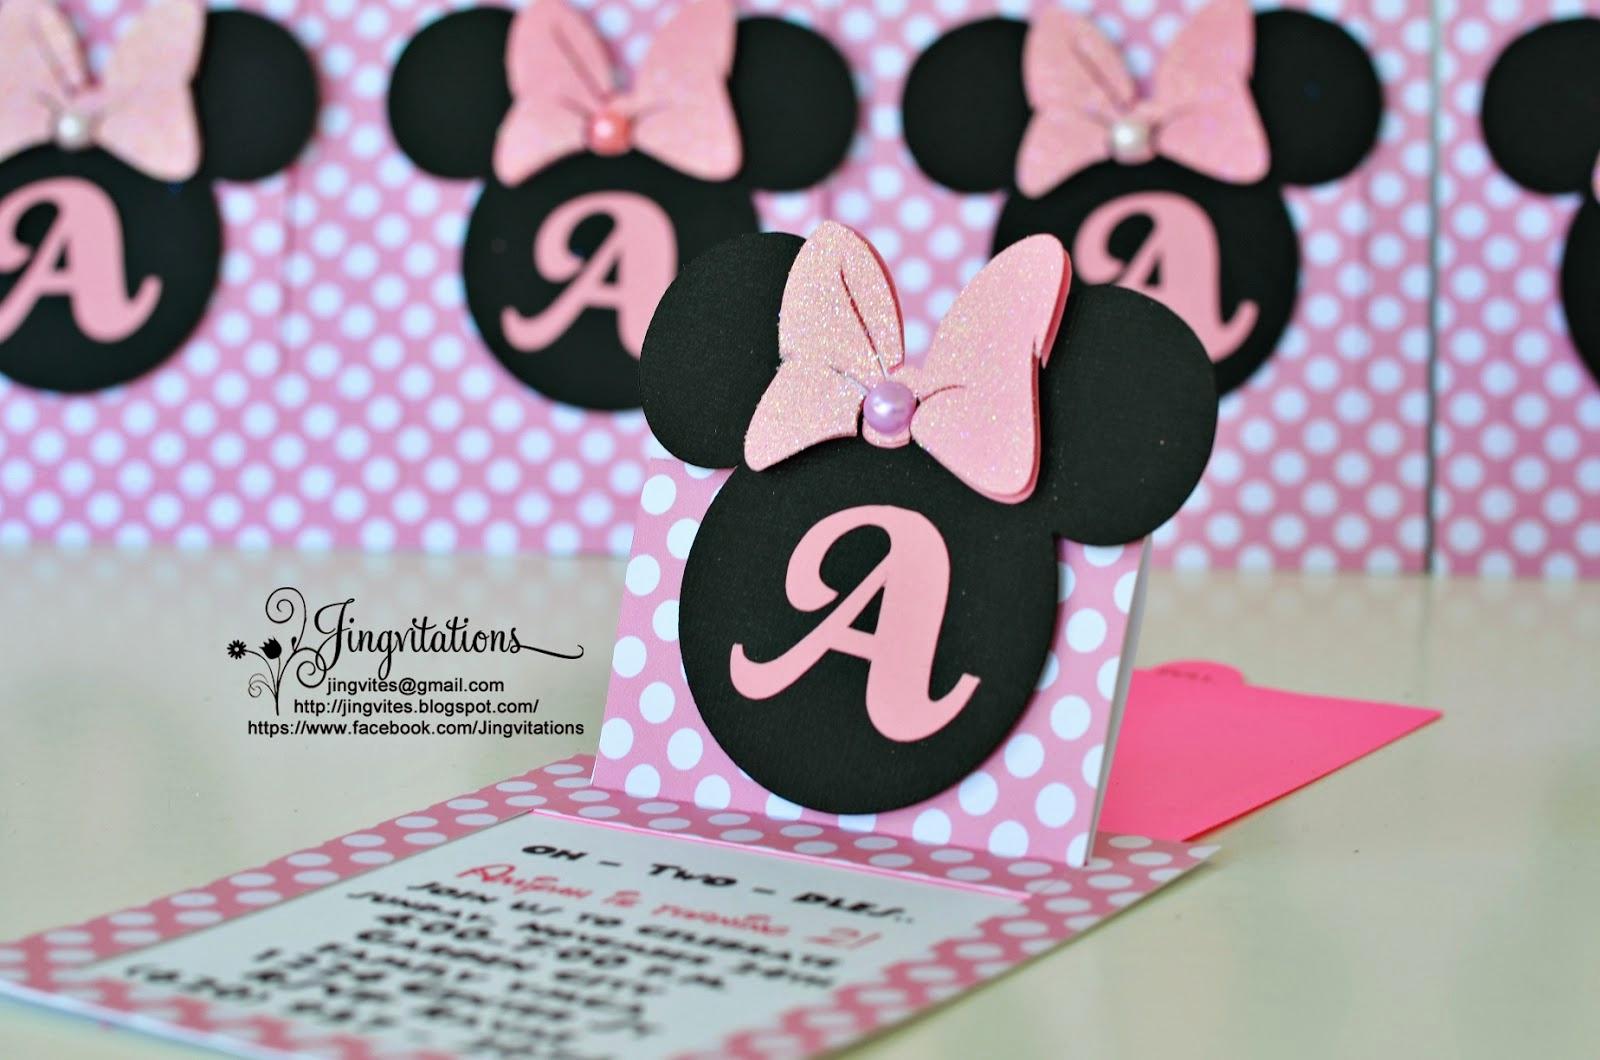 Diy Minnie Mouse Invitation Unique Jingvitations Cricut Handmade Minnie Mouse Pop Up Invitations